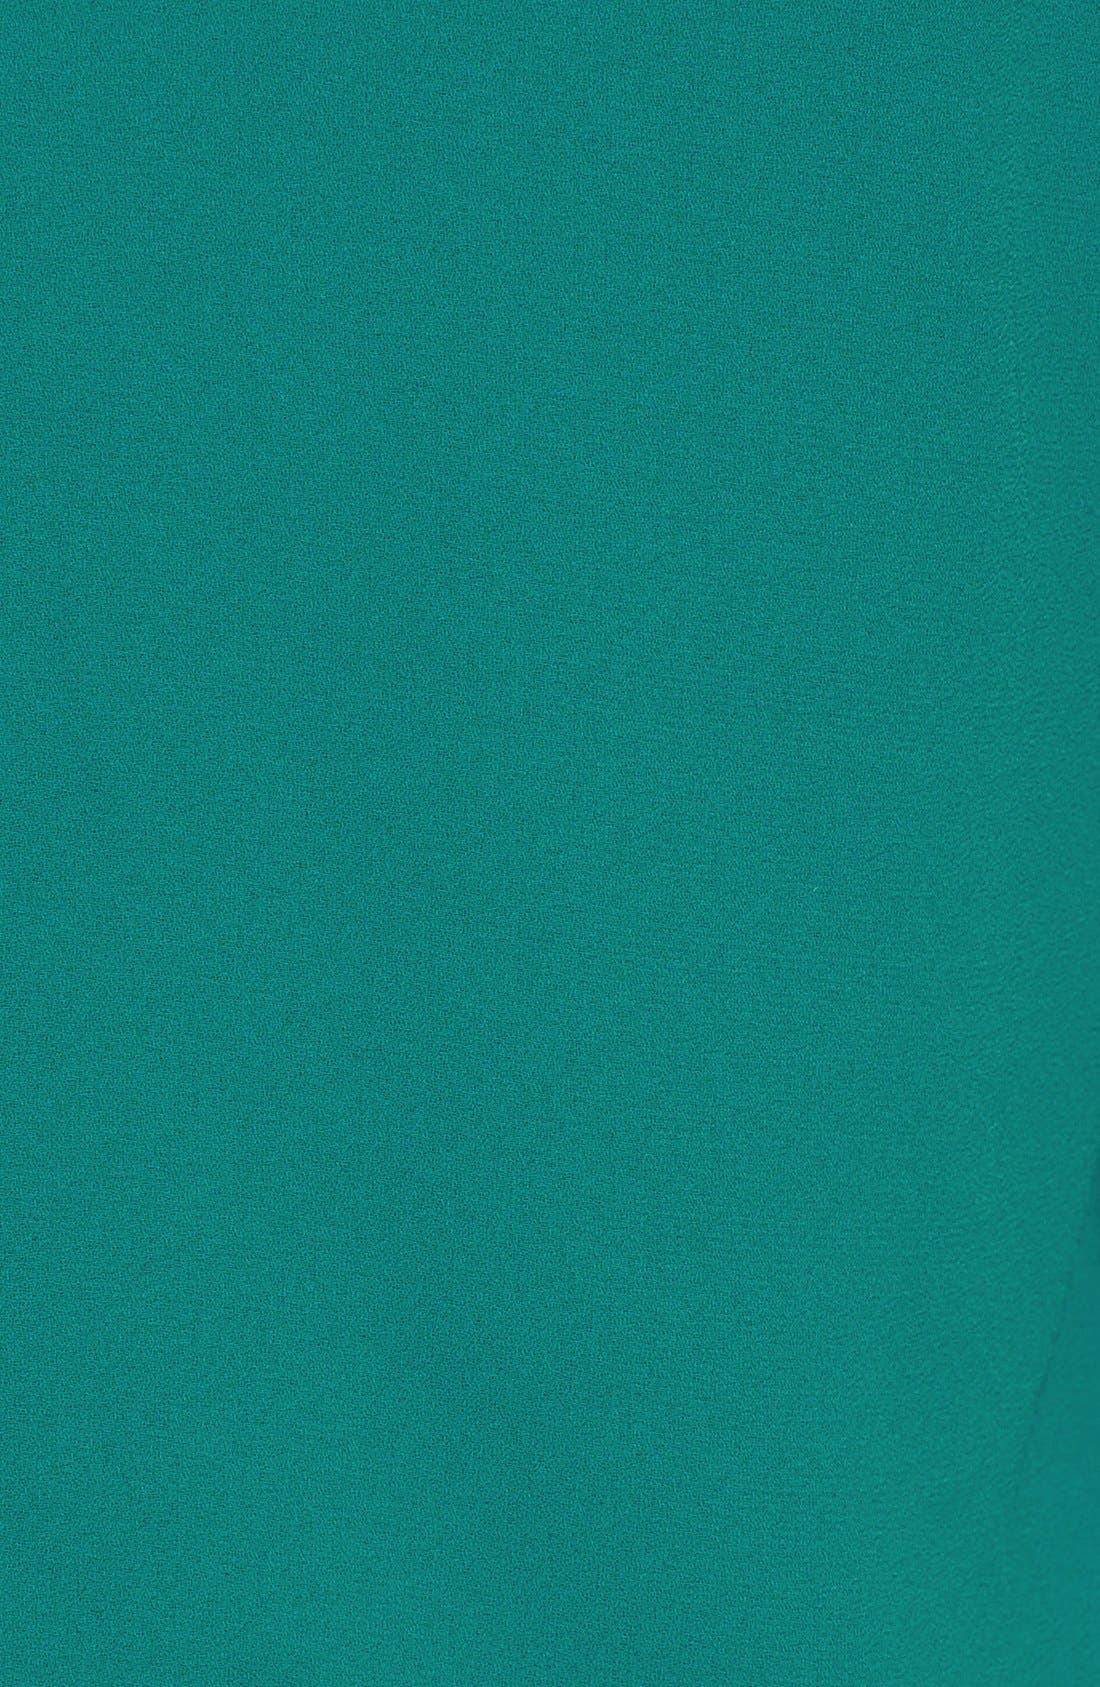 Alternate Image 3  - Lush Colorblock Blouson Romper (Juniors)